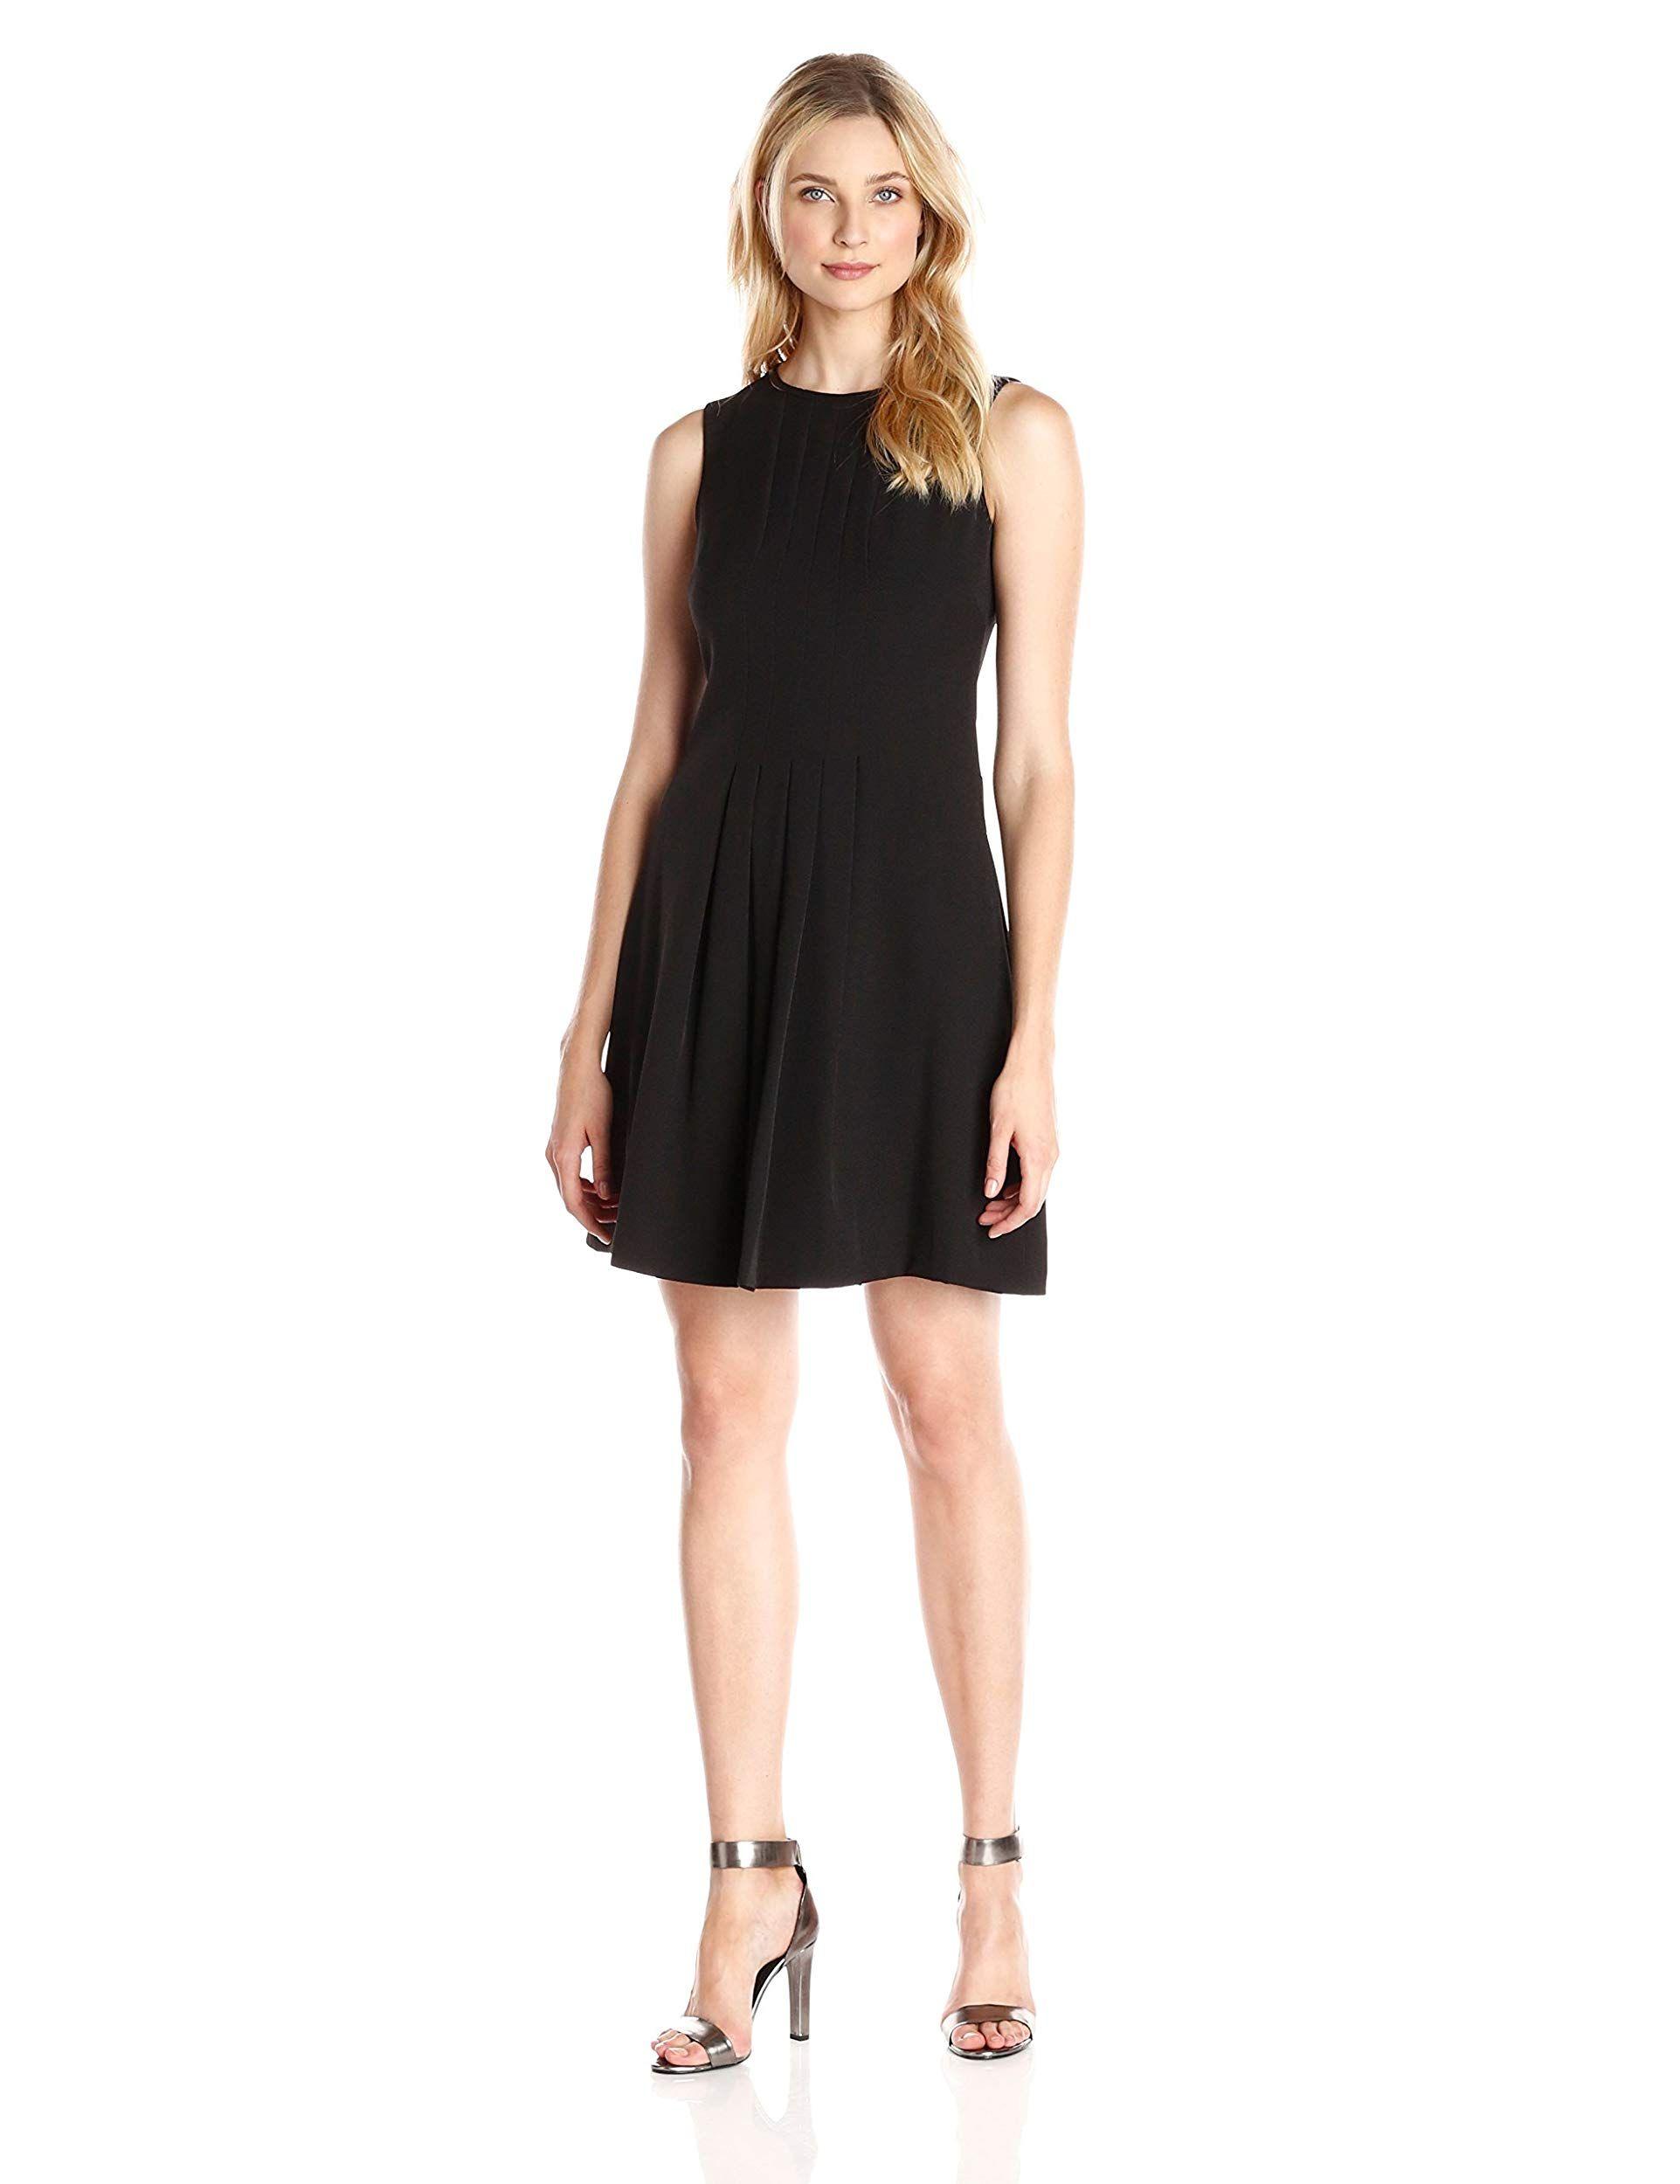 Amazon Vince Camuto Women S Sleeveless A Line Pleated Dress Masha Voronina Product Page Https Www Ama Pleated Shift Dress Clothes Design Fashion [ 2500 x 1923 Pixel ]